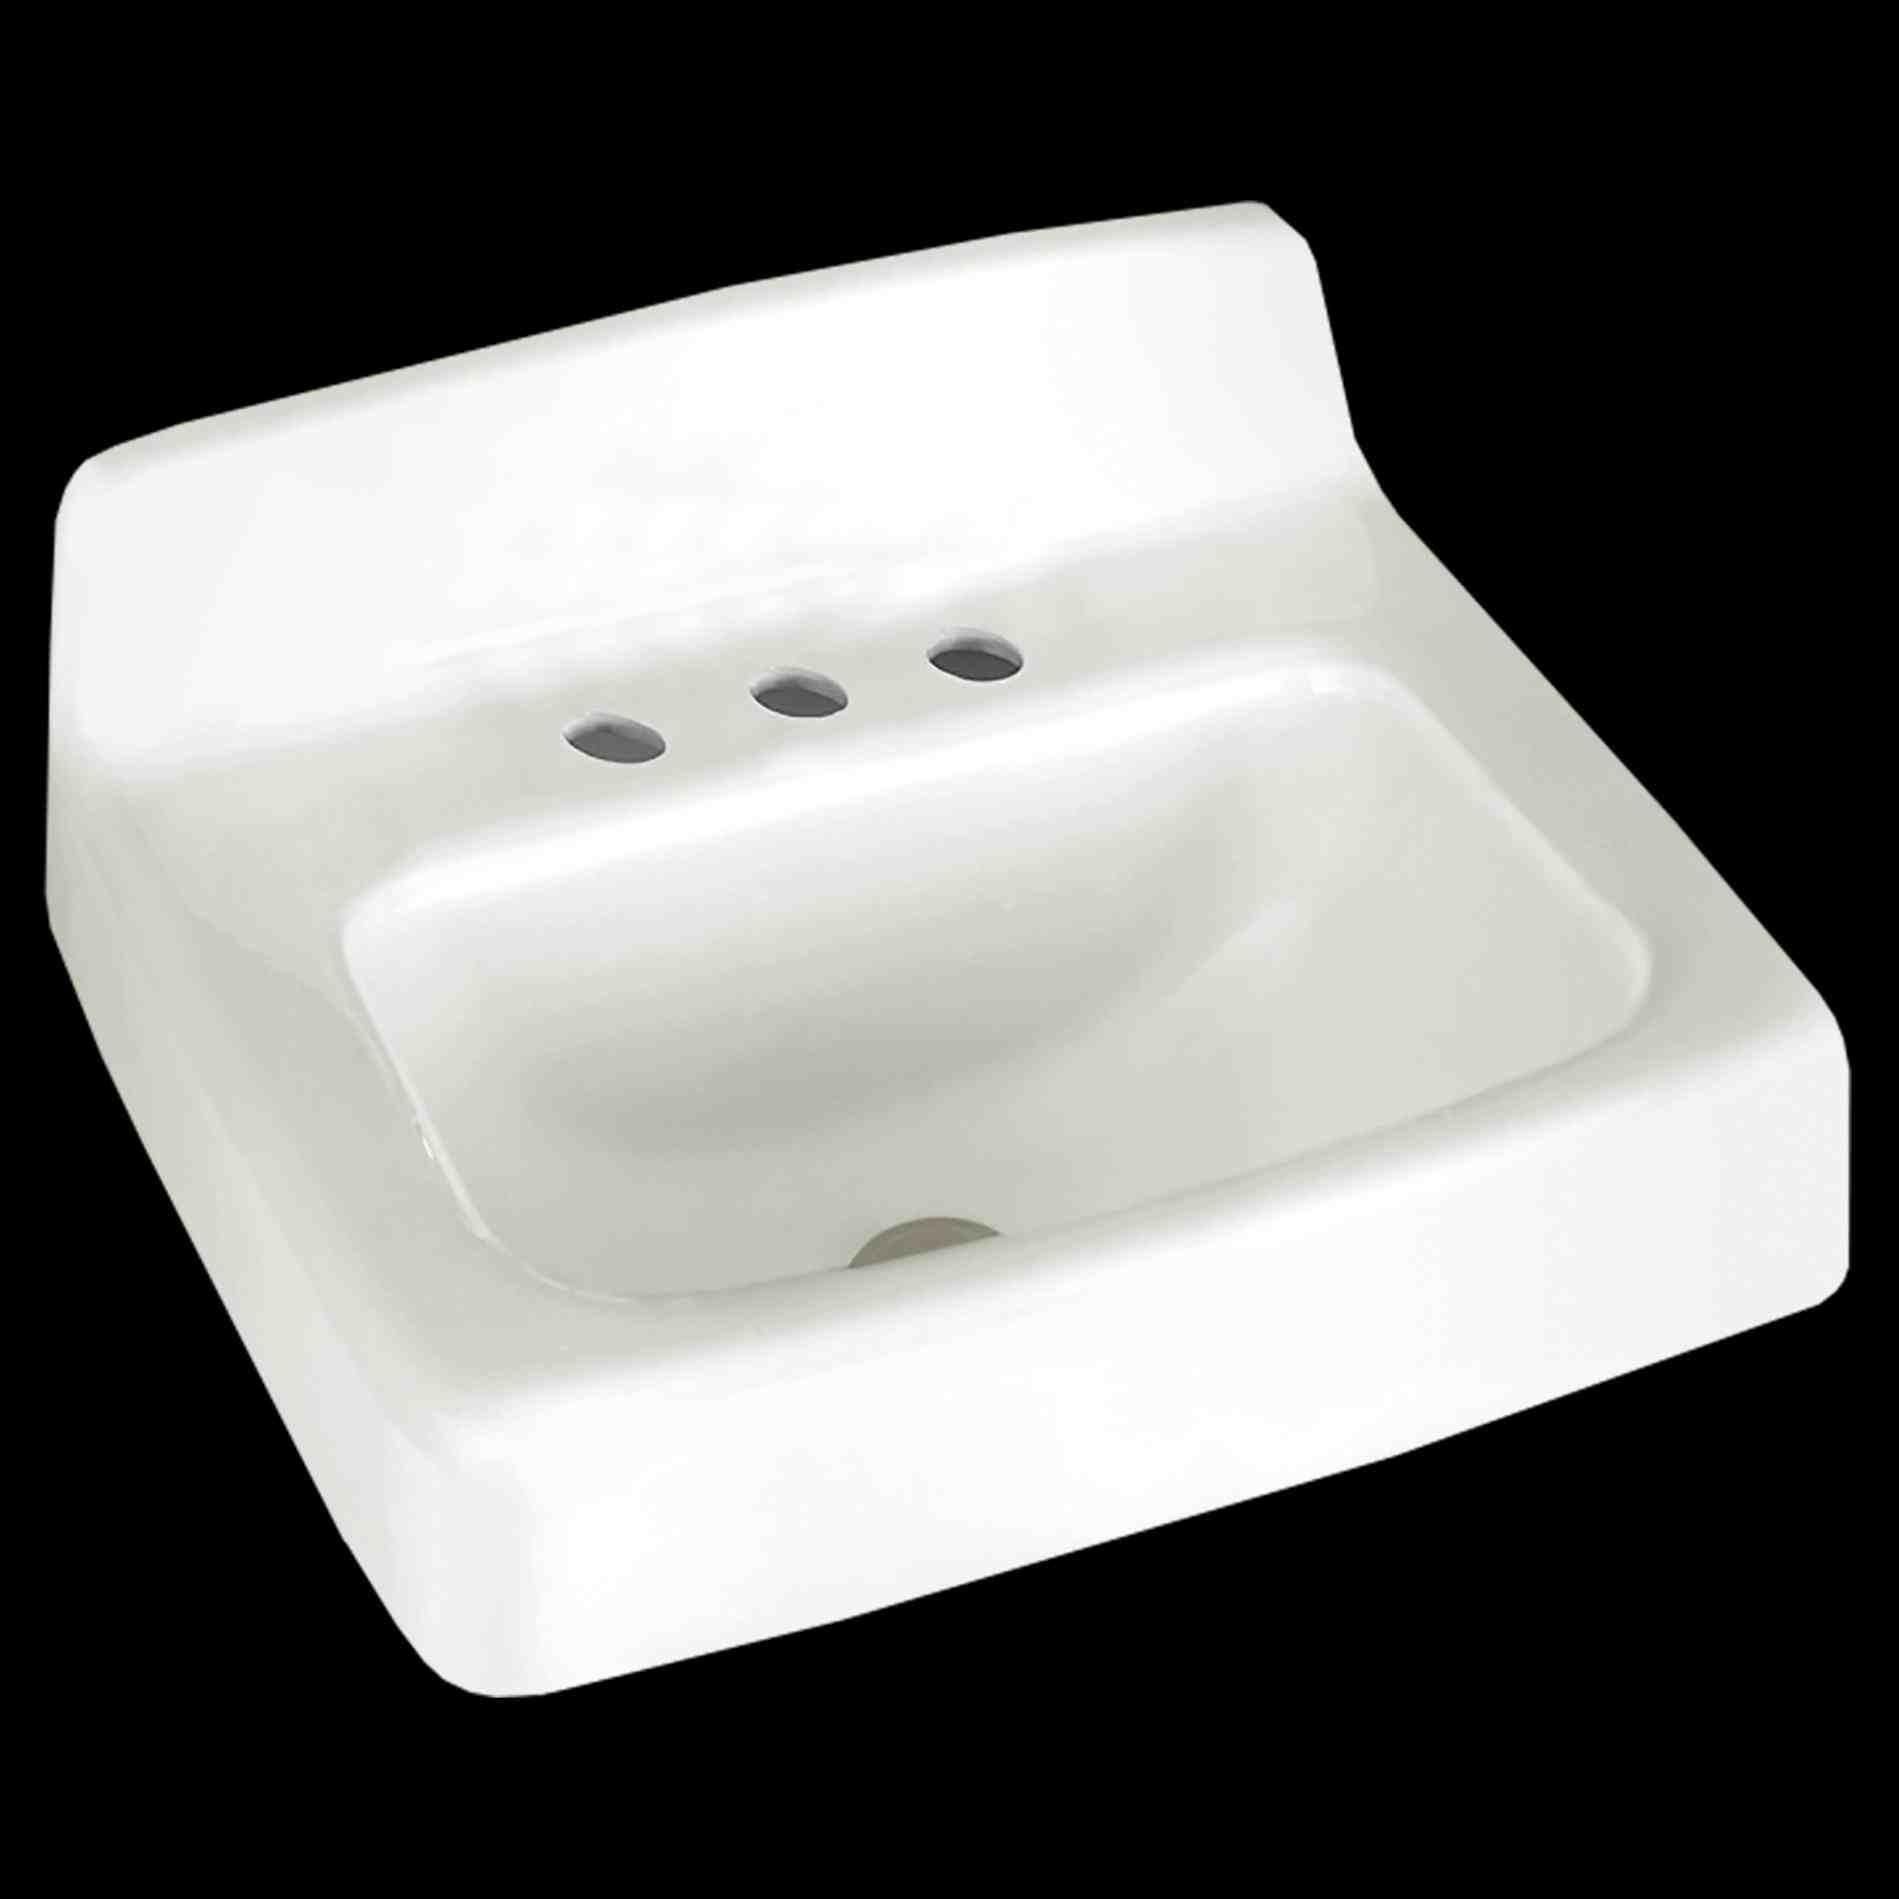 This bathtub plan png - onovo start. bathtubs - studio 72 inch by 36 ...